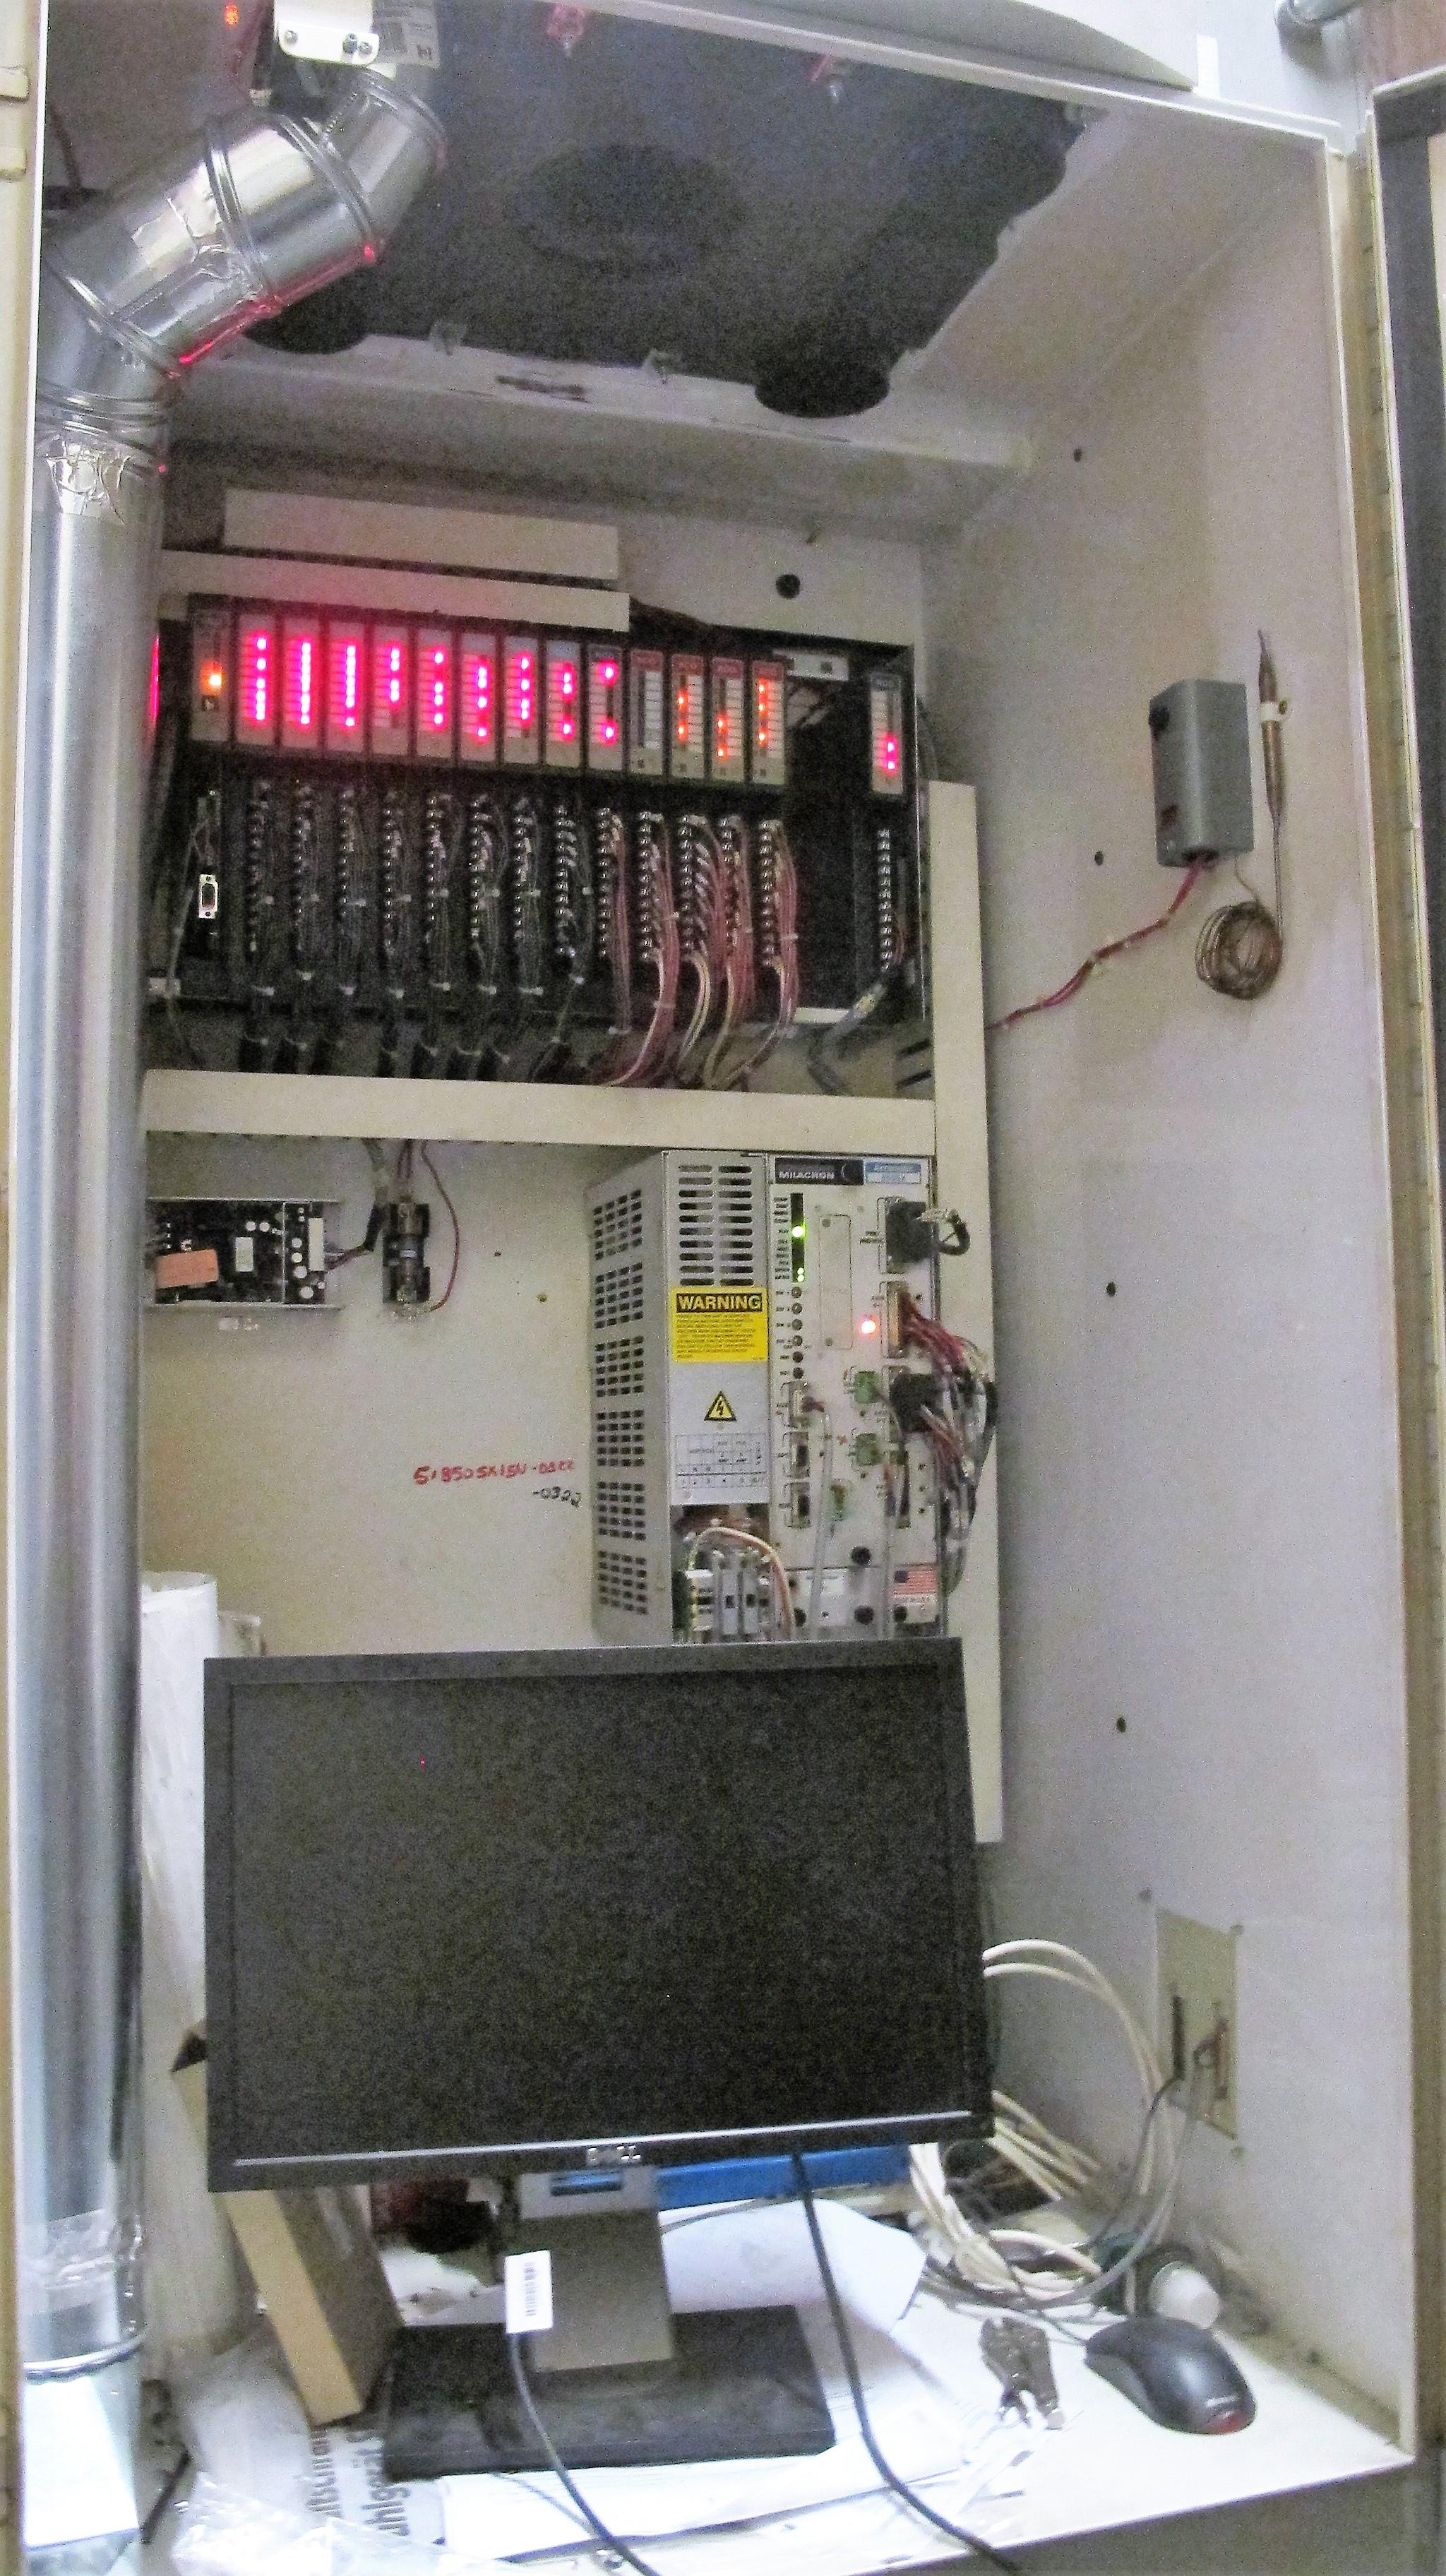 "CINCINNATI MILACRON20VC CNC VERTICAL MILLING MACHINING, 80"" x 30"" TABLE, ACRAMATIC 850SX CNC - Image 12 of 20"